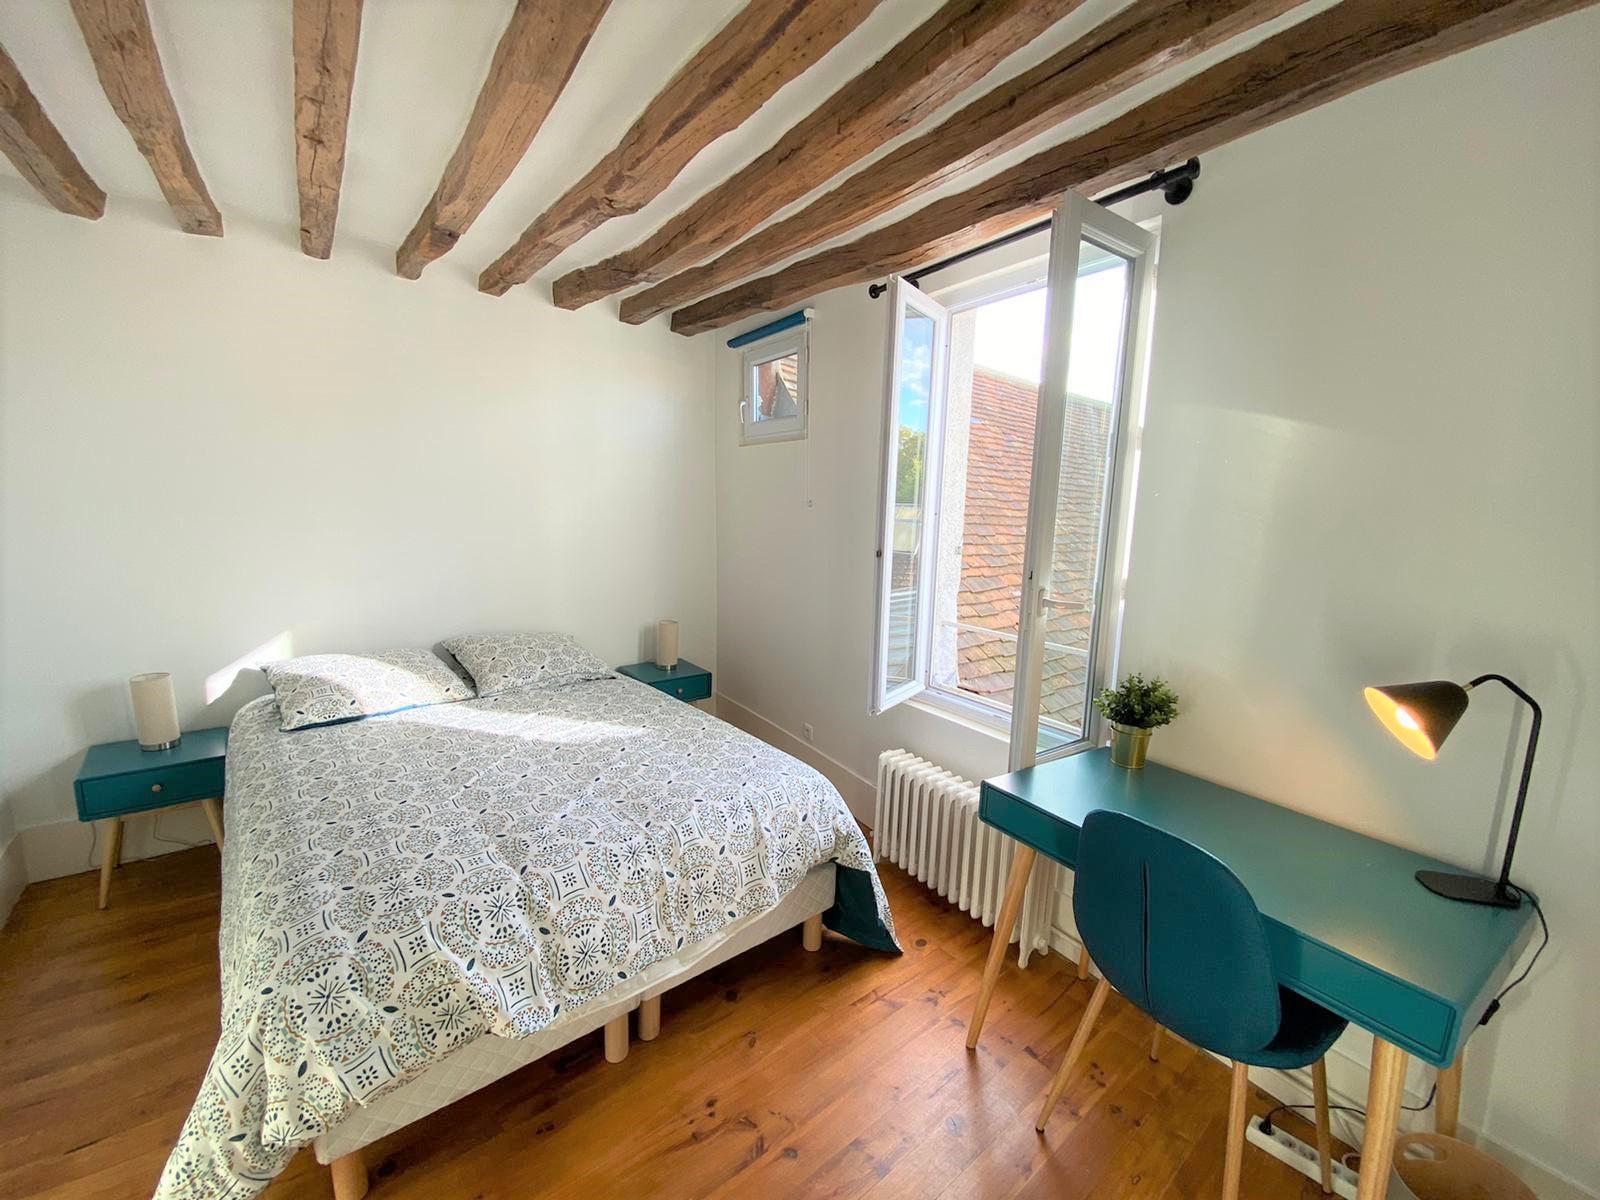 Bedroom 3 Insead MBA housing